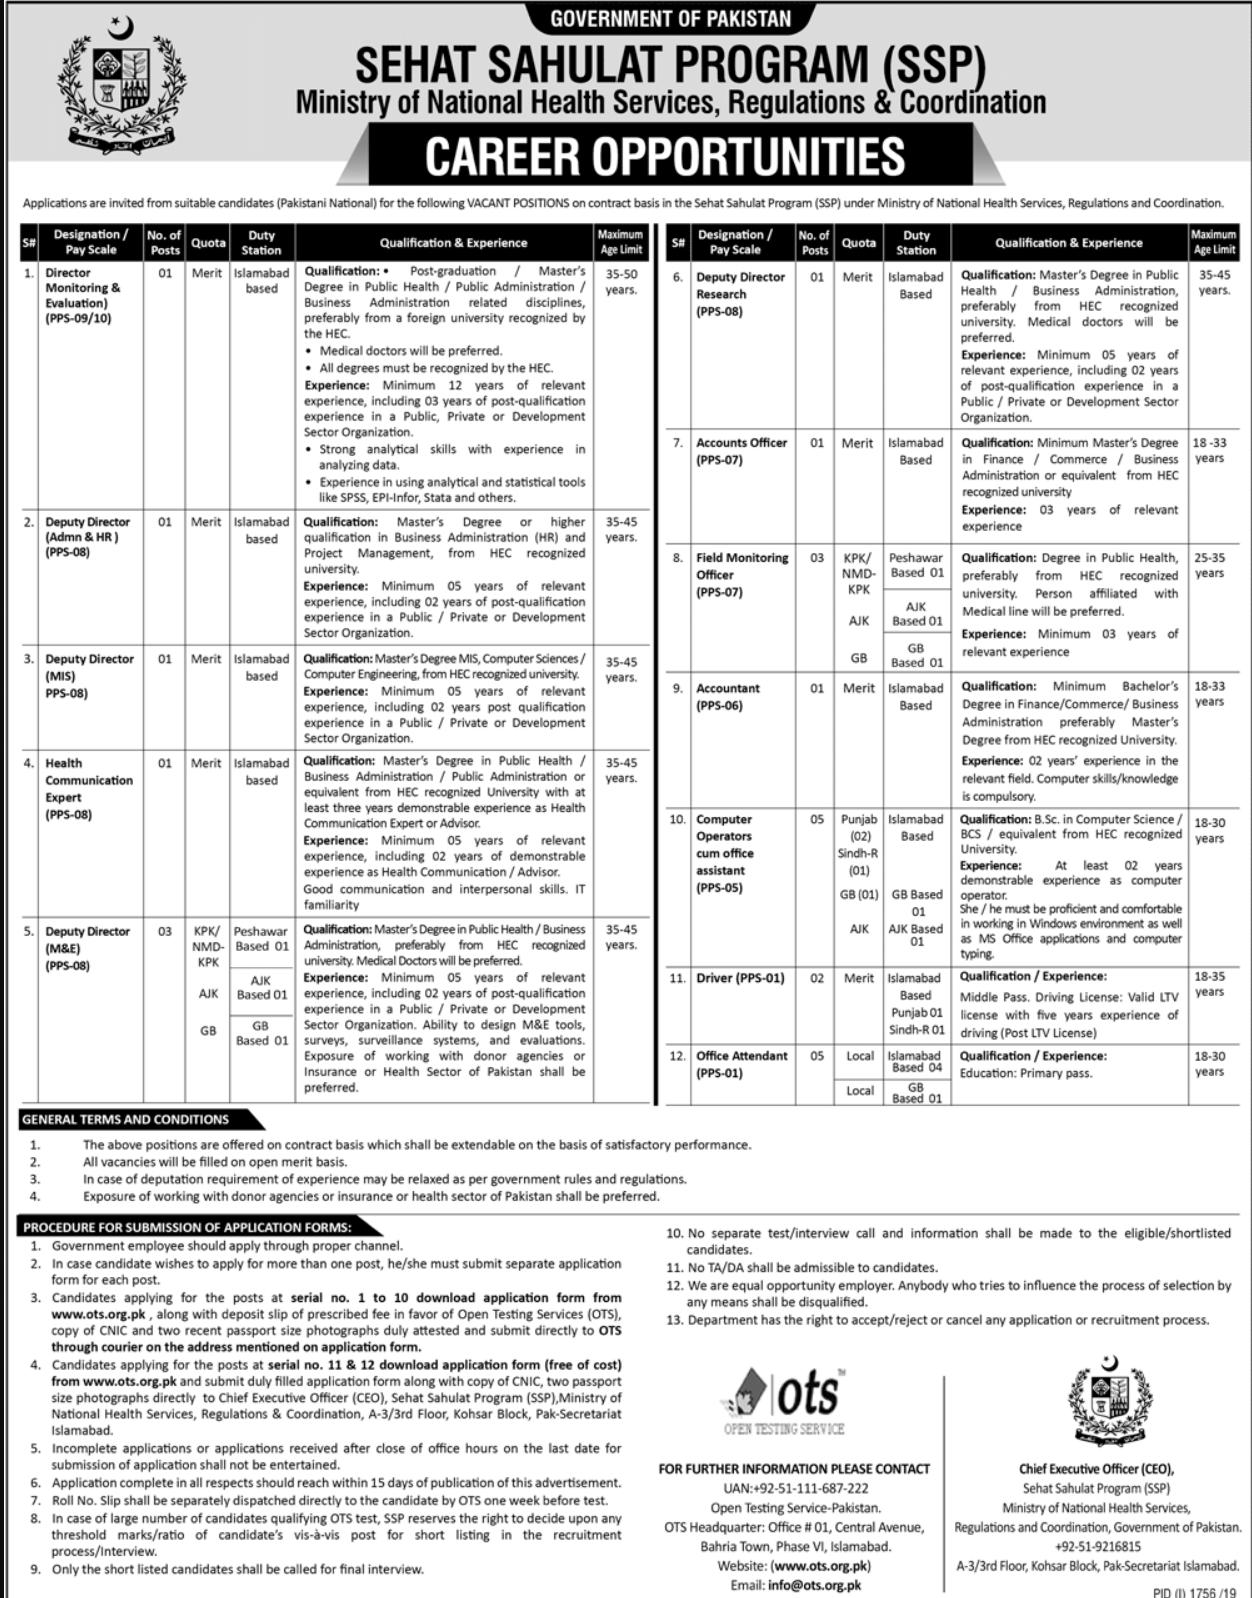 NHSRC Sehat Sahulat Program SSP Jobs 2019 OTS Application Form Roll No Slip